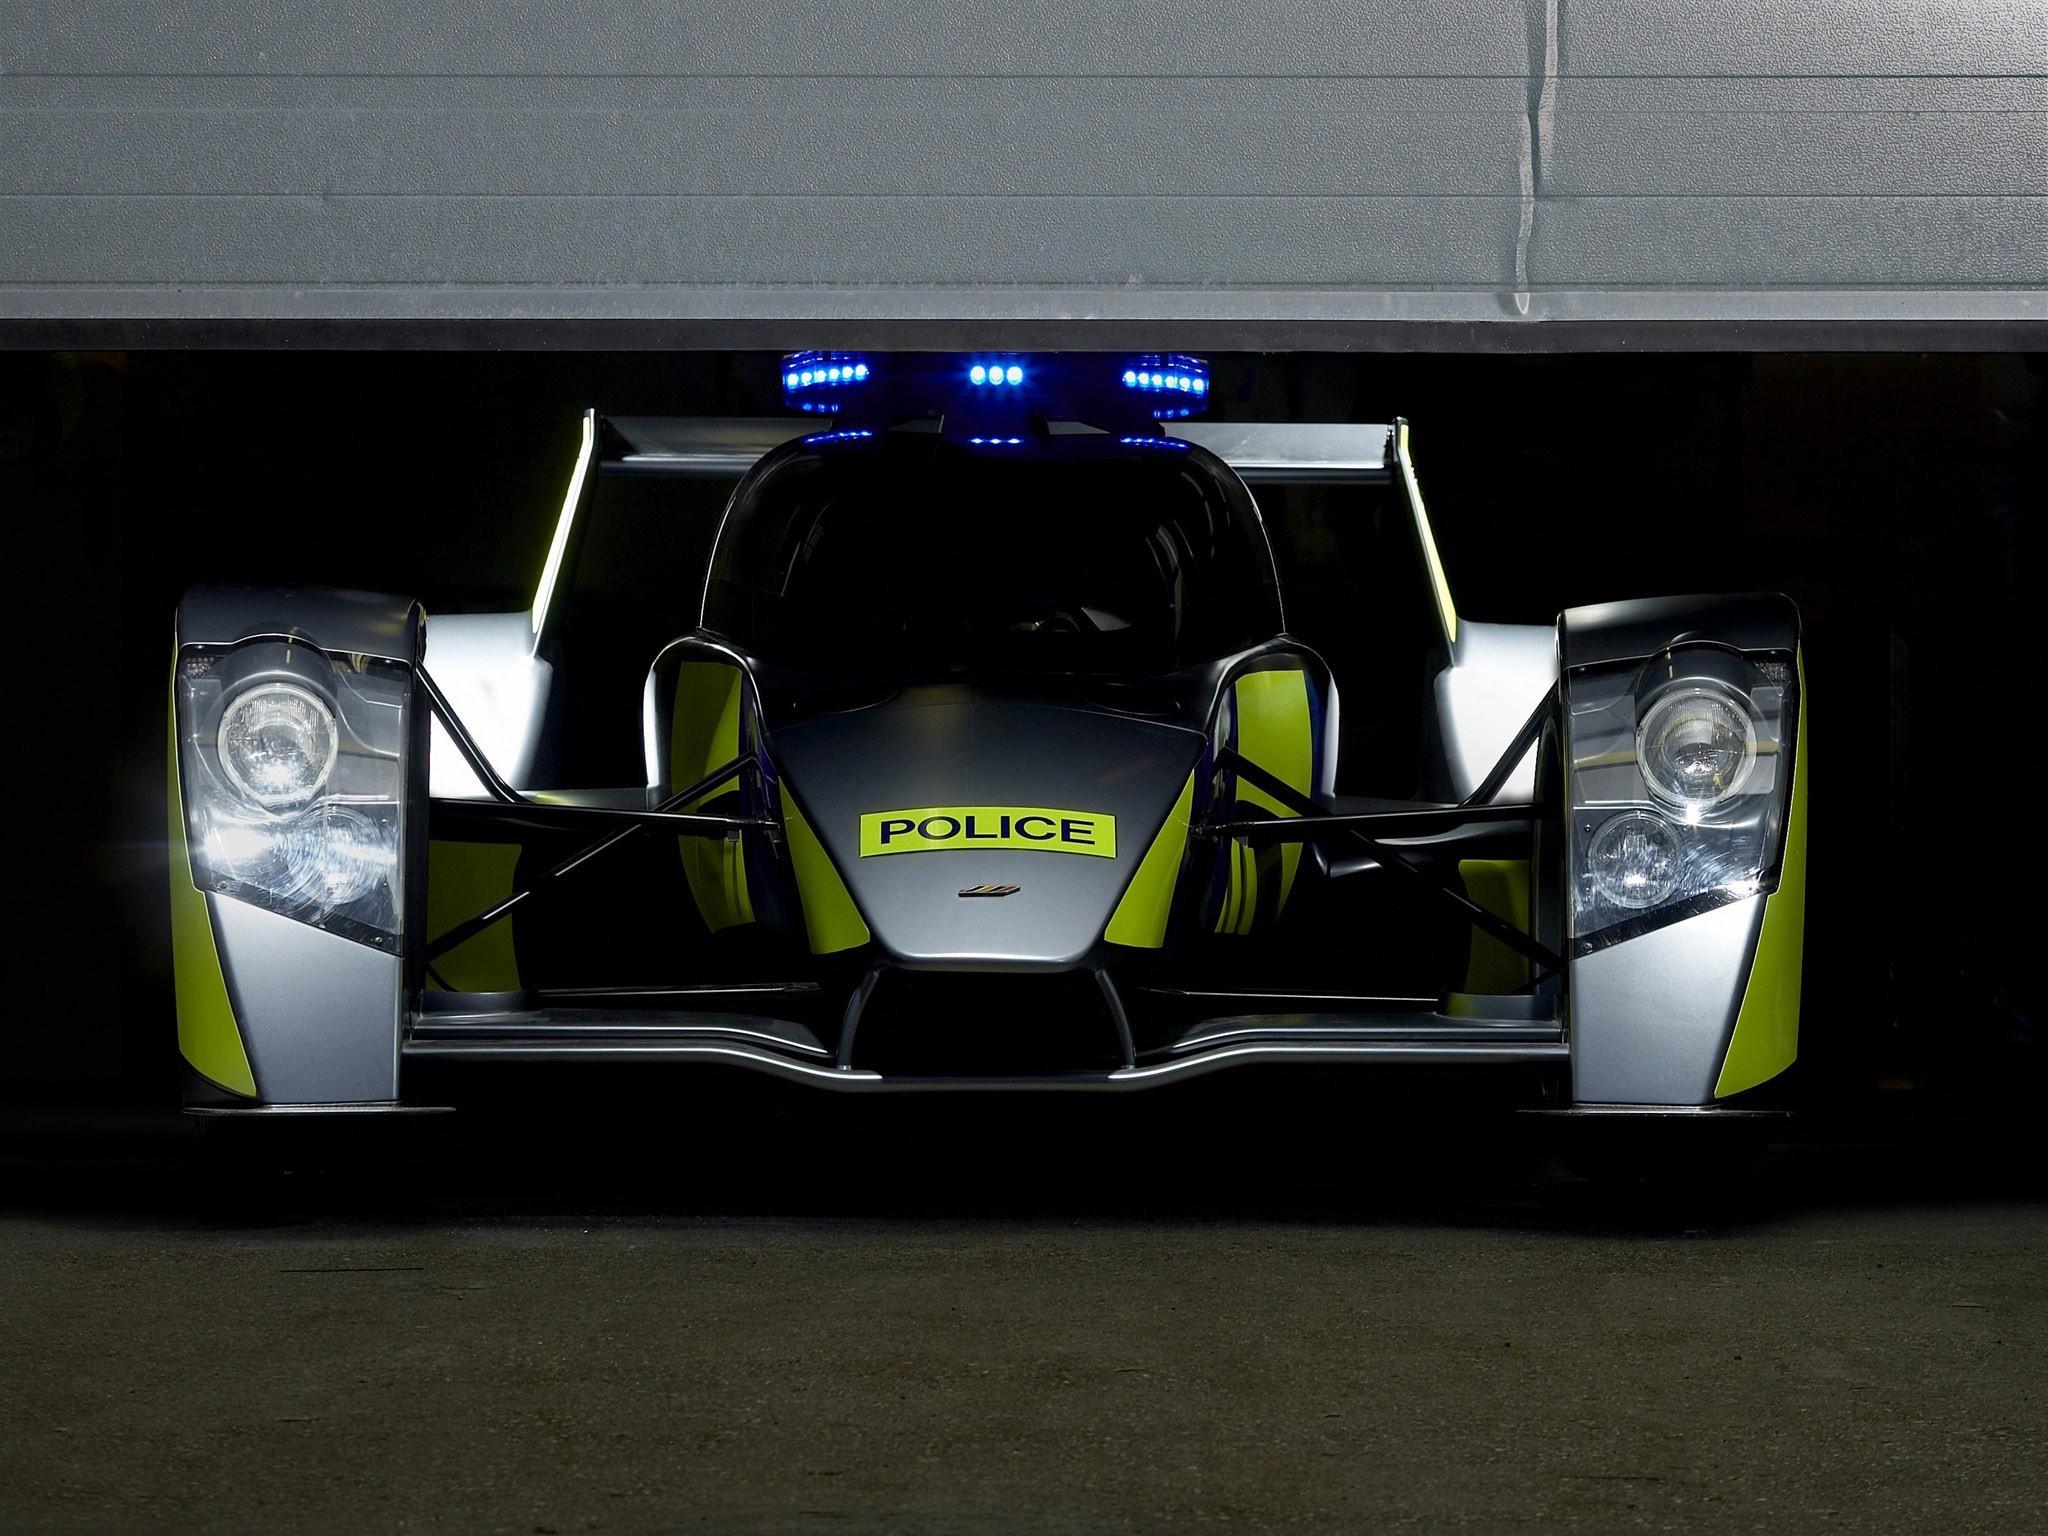 2007 Caparo T1 Police